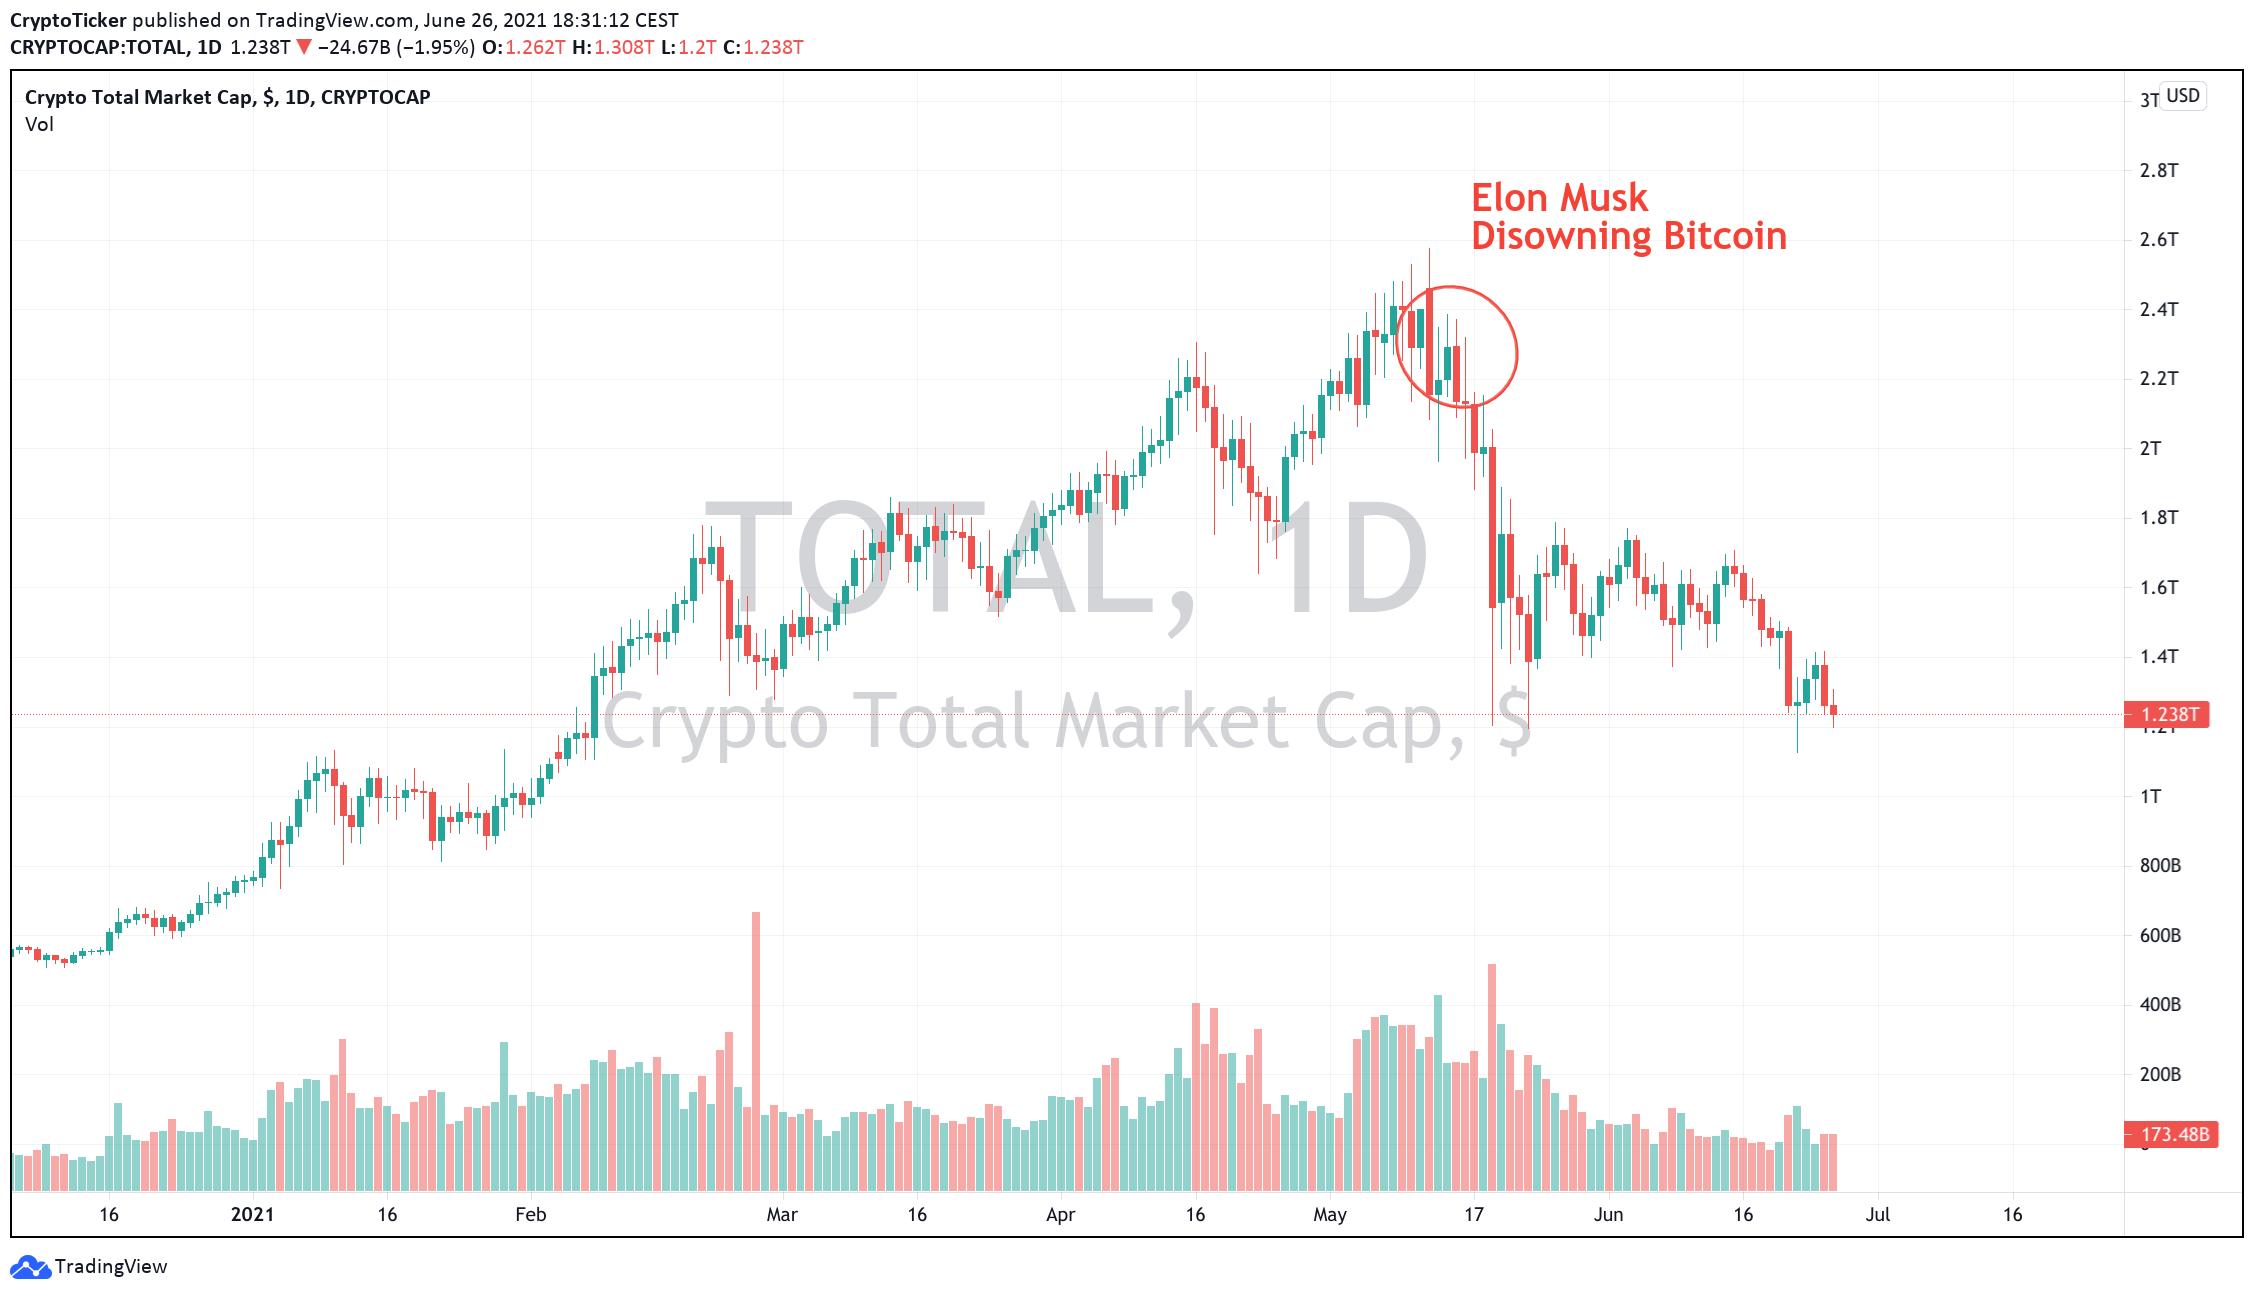 Elon Musk Crypto - Total Crypto Market cap post Elon disowning Bitcoins